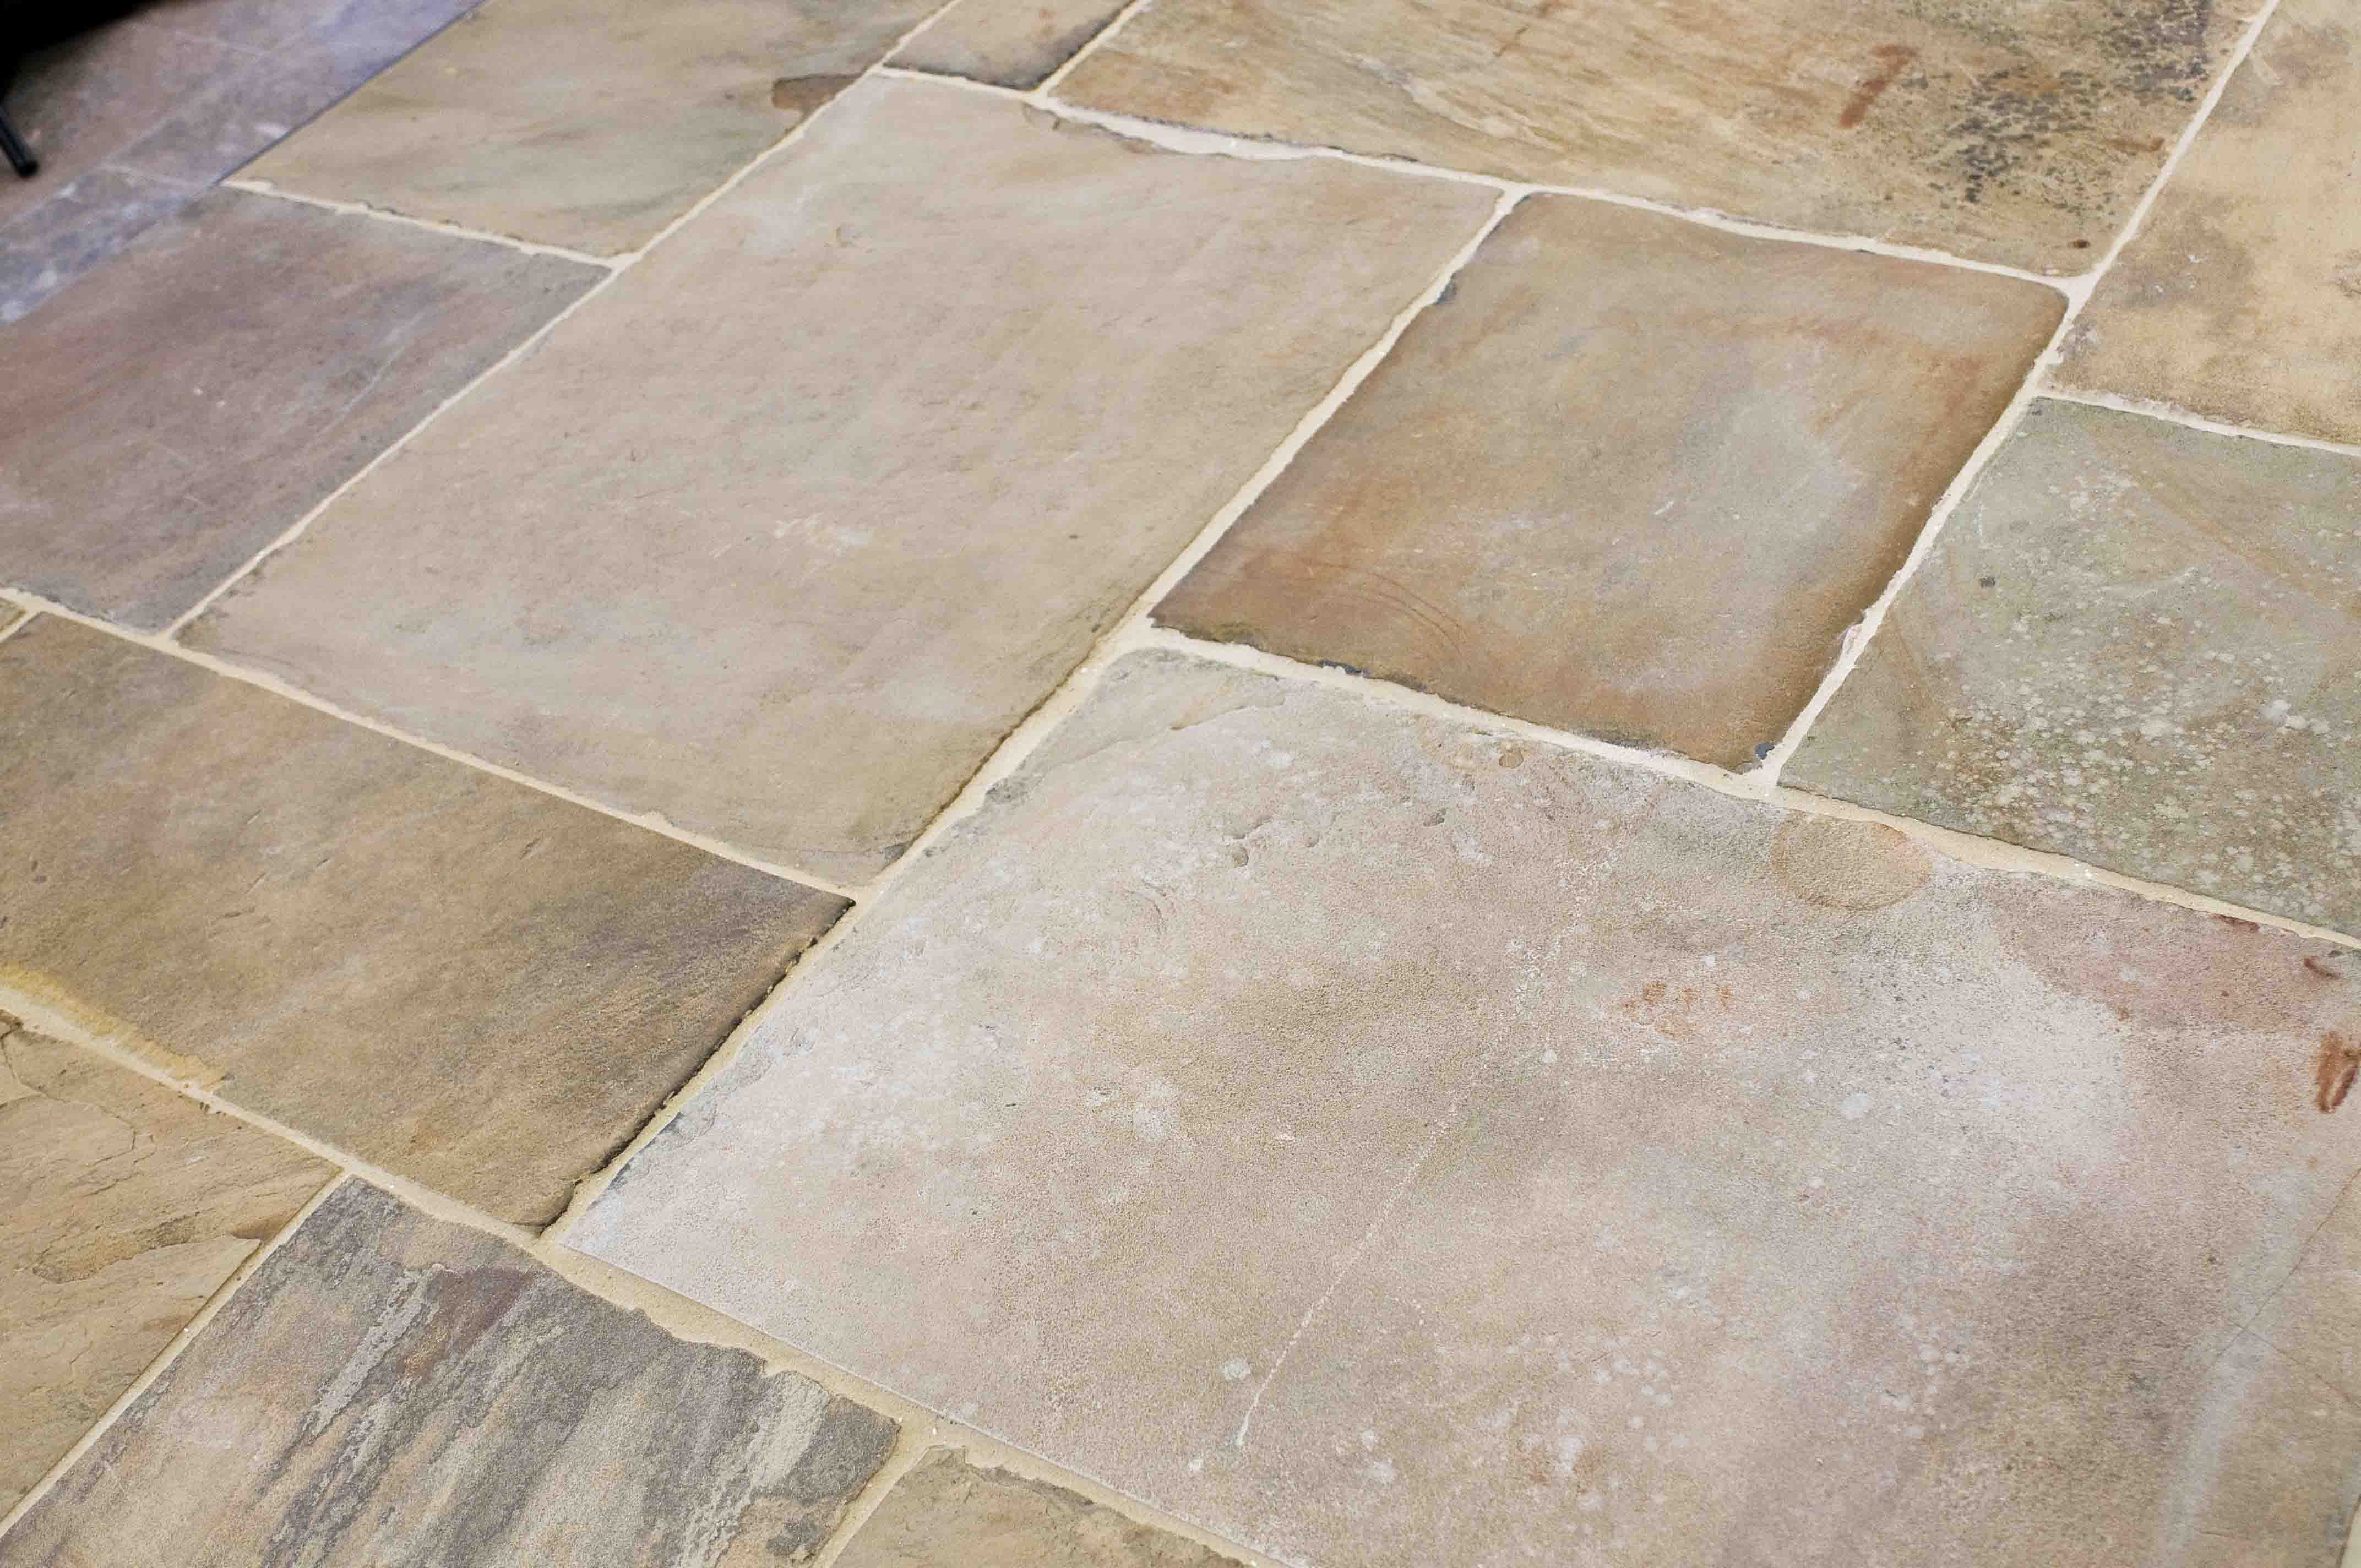 Accessories furnitureimpressive pale natural stone floor tile accessories furnitureimpressive pale natural stone floor tile for veranda tile floorbest dailygadgetfo Images